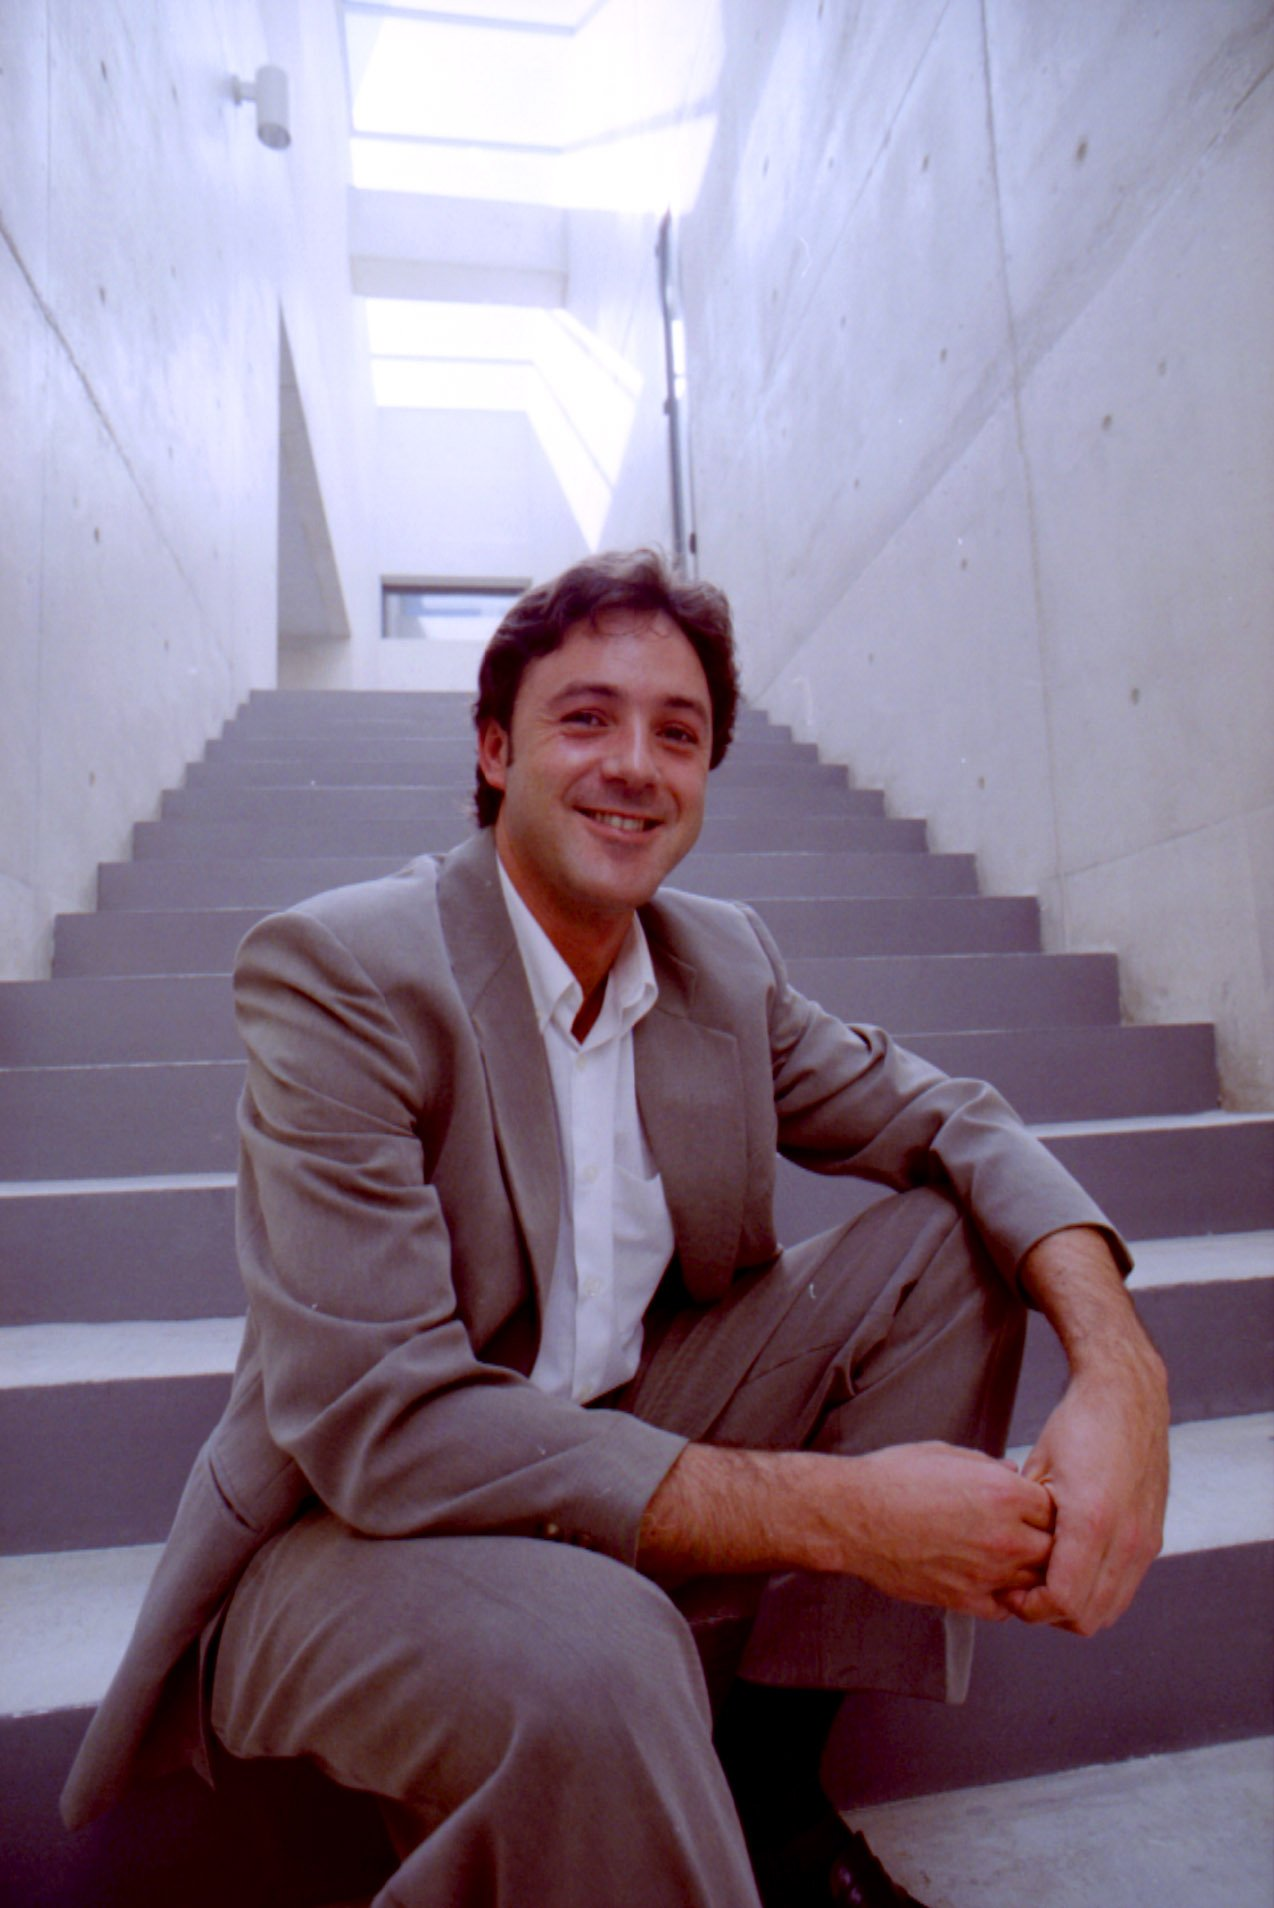 Pedro Roncal en 1996. || Fuente: Wikimedia Commons